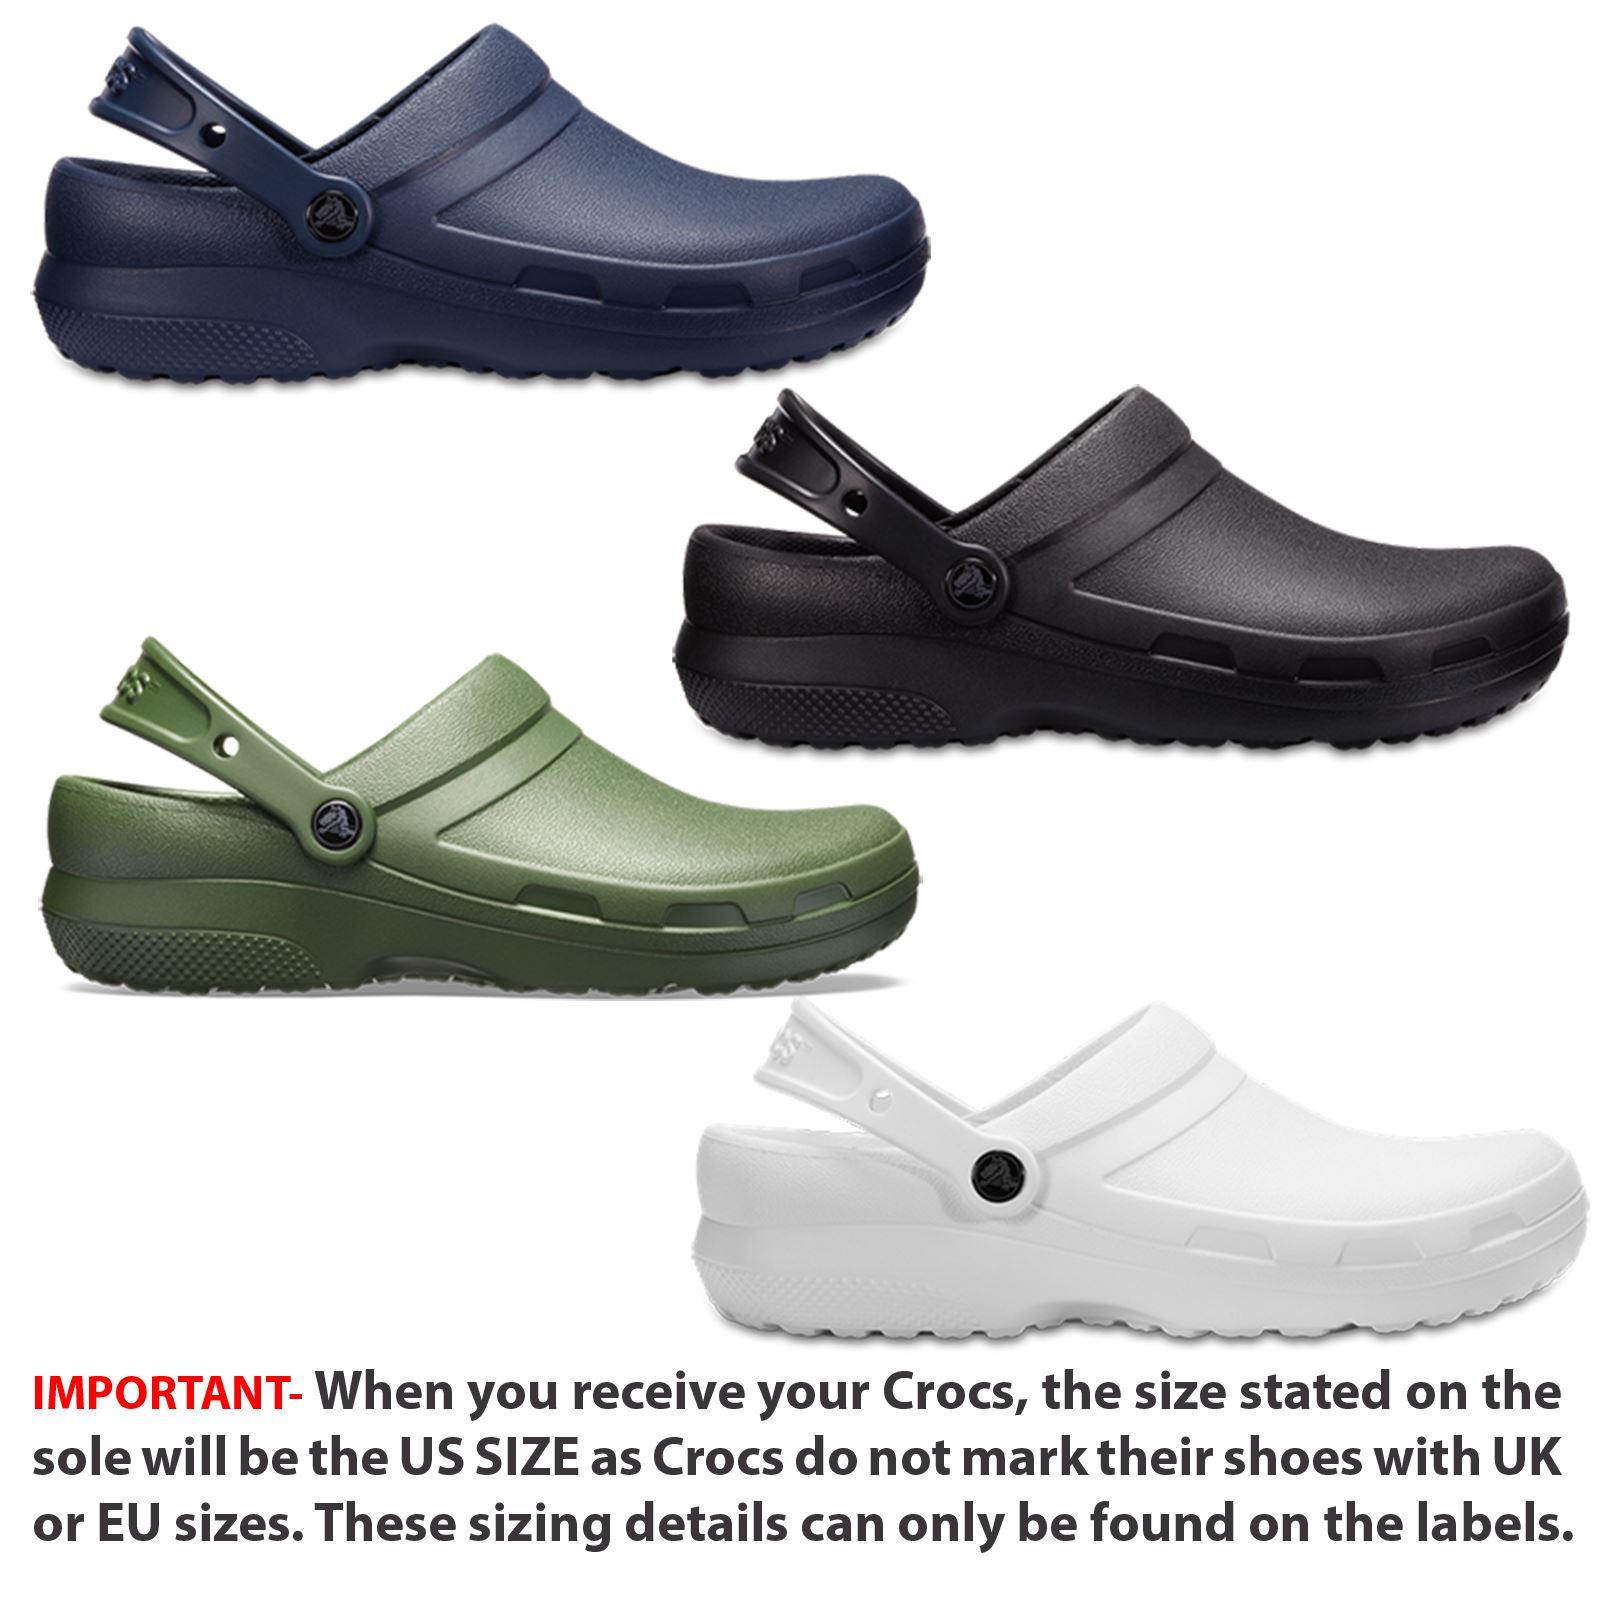 ebaaec7e77c8c8 Crocs Specialist II Medical Work Professionals Roomy Fit Clogs Shoes Sandals